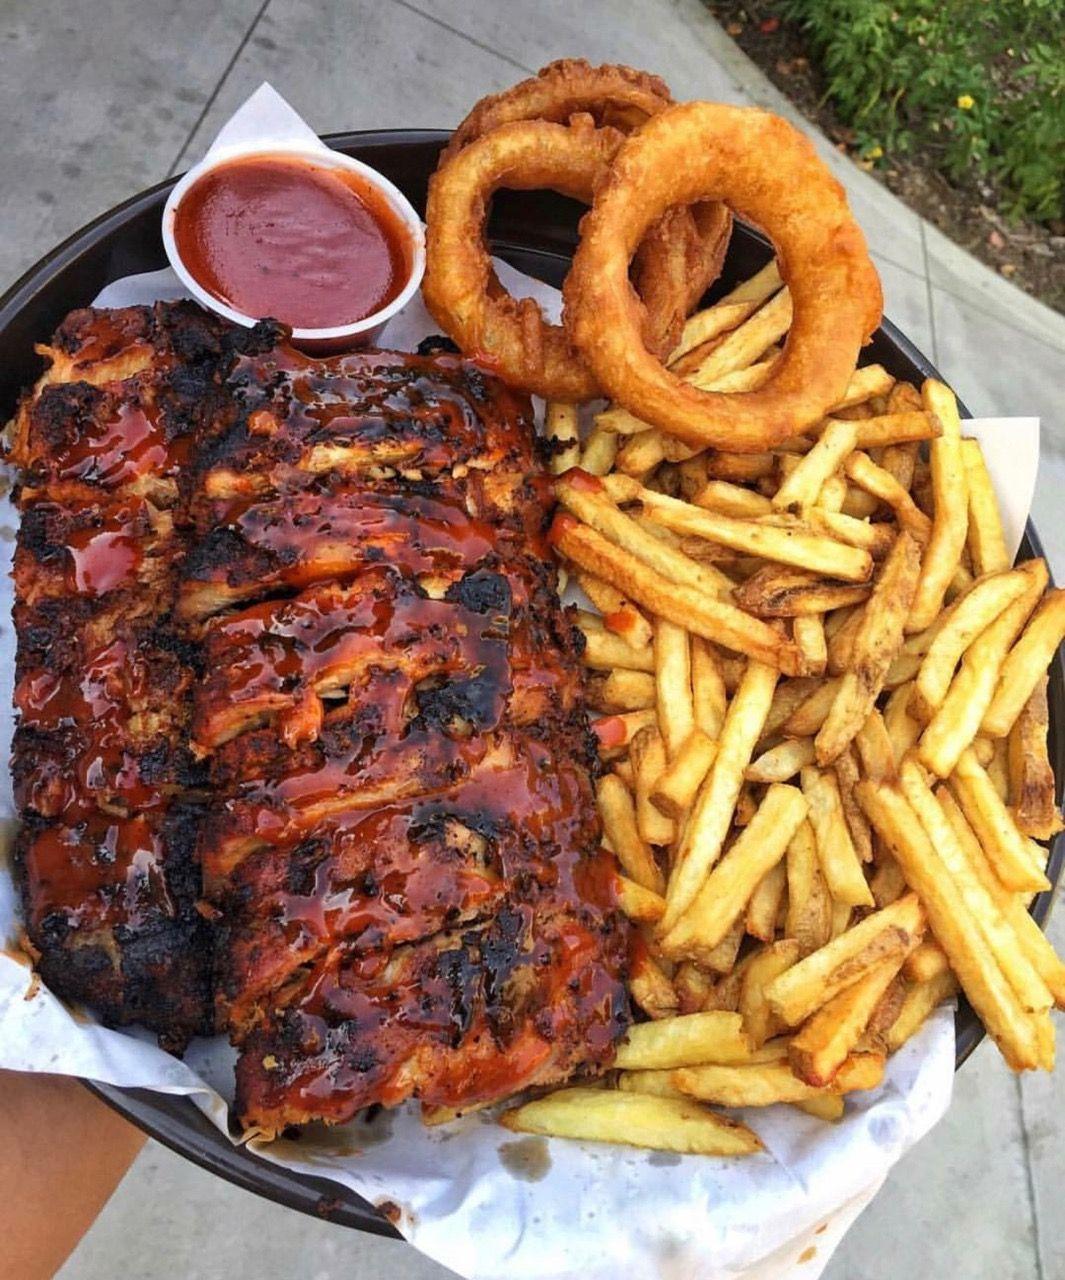 Épinglé par Kodrohreine sur Food and drink Nourriture